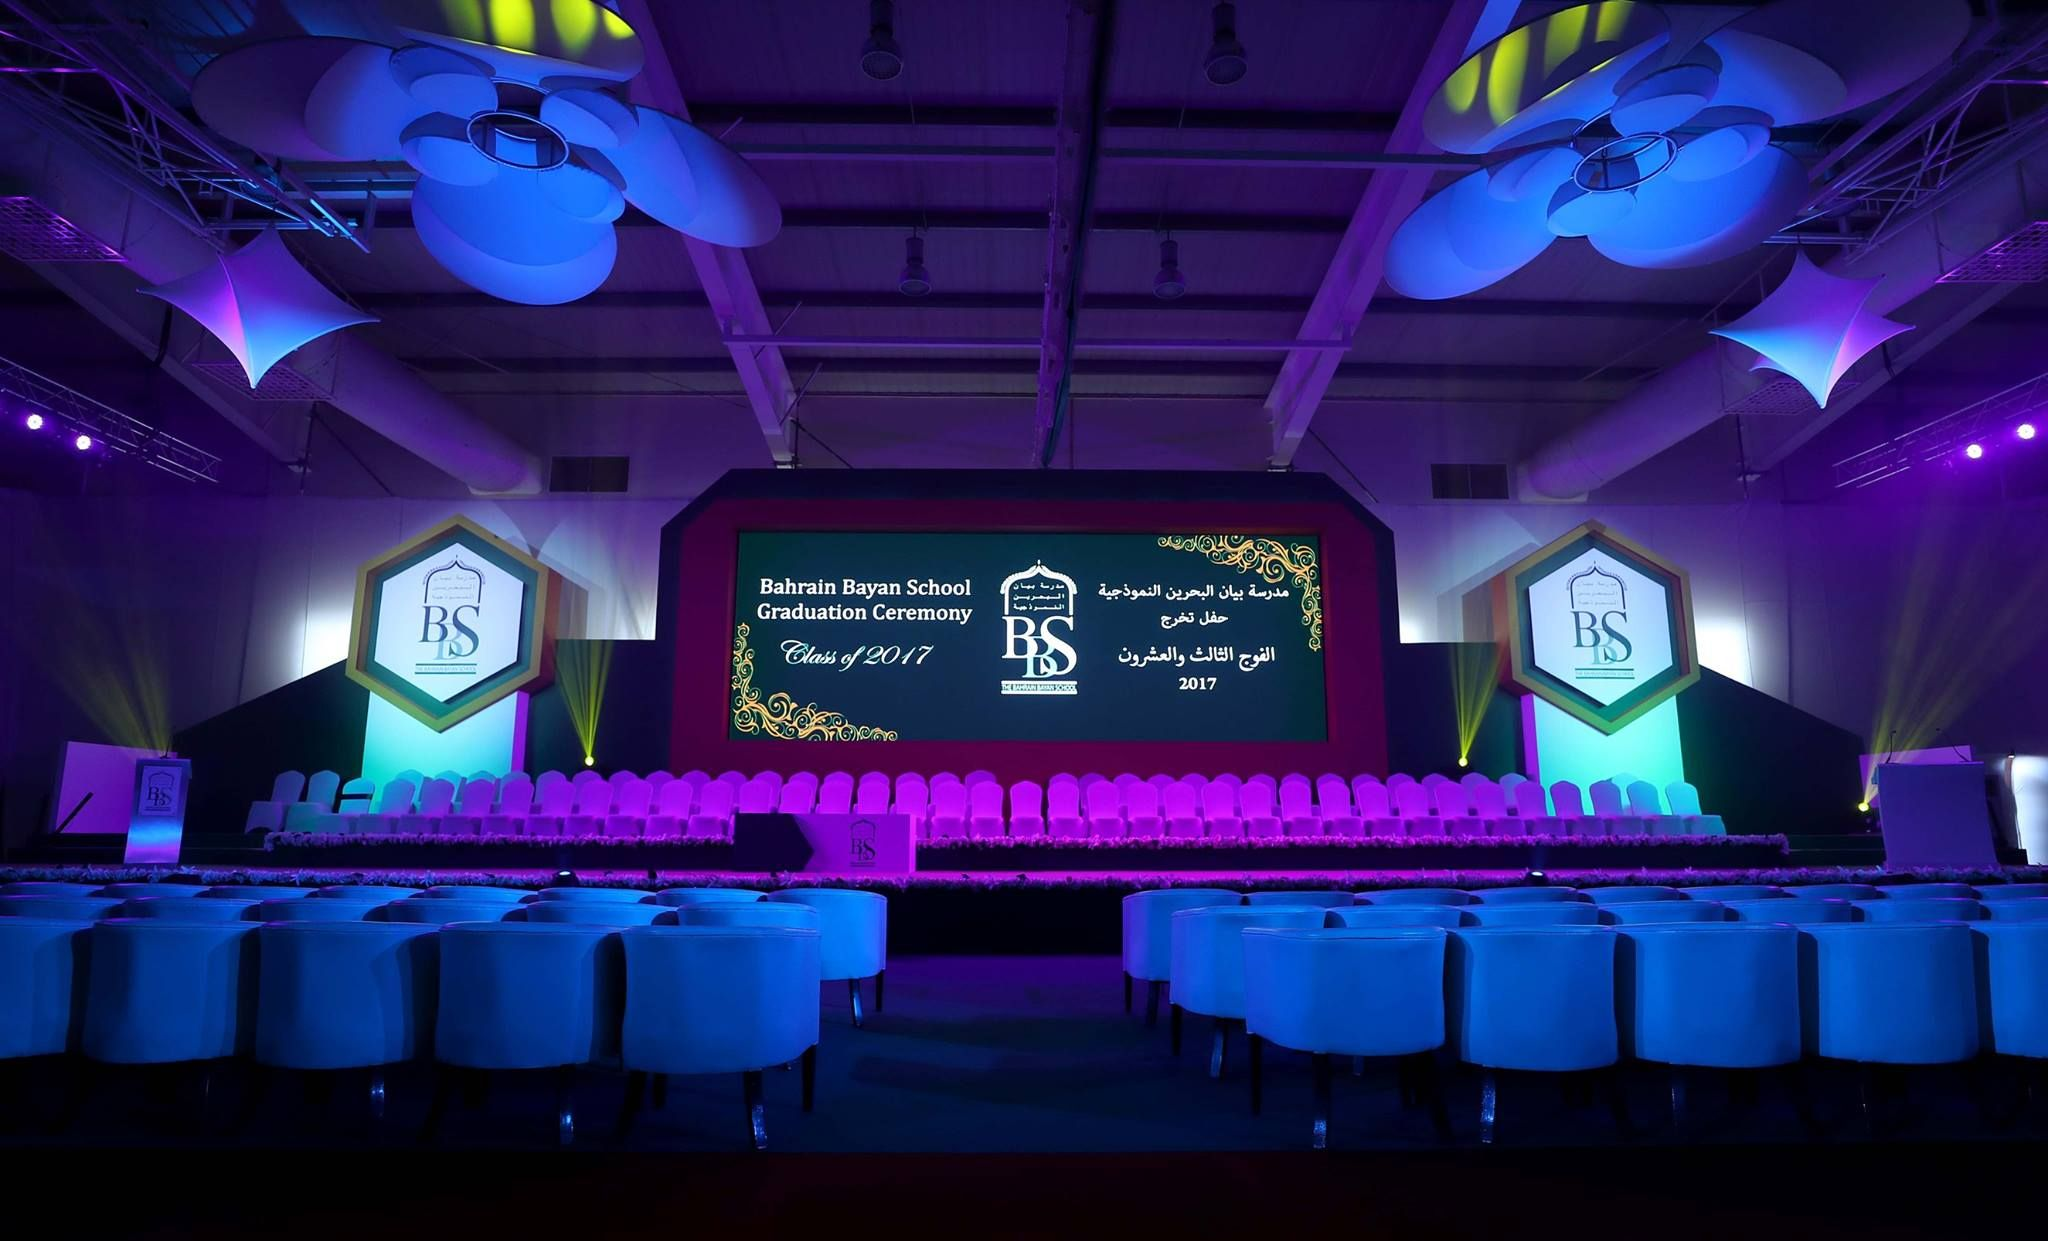 Pico Delivered A Majestic Graduation Ceremony For Bahrain Bayan School Pico Graduation Ceremony Bahra Event Marketing Marketing Case Study Event Organiser